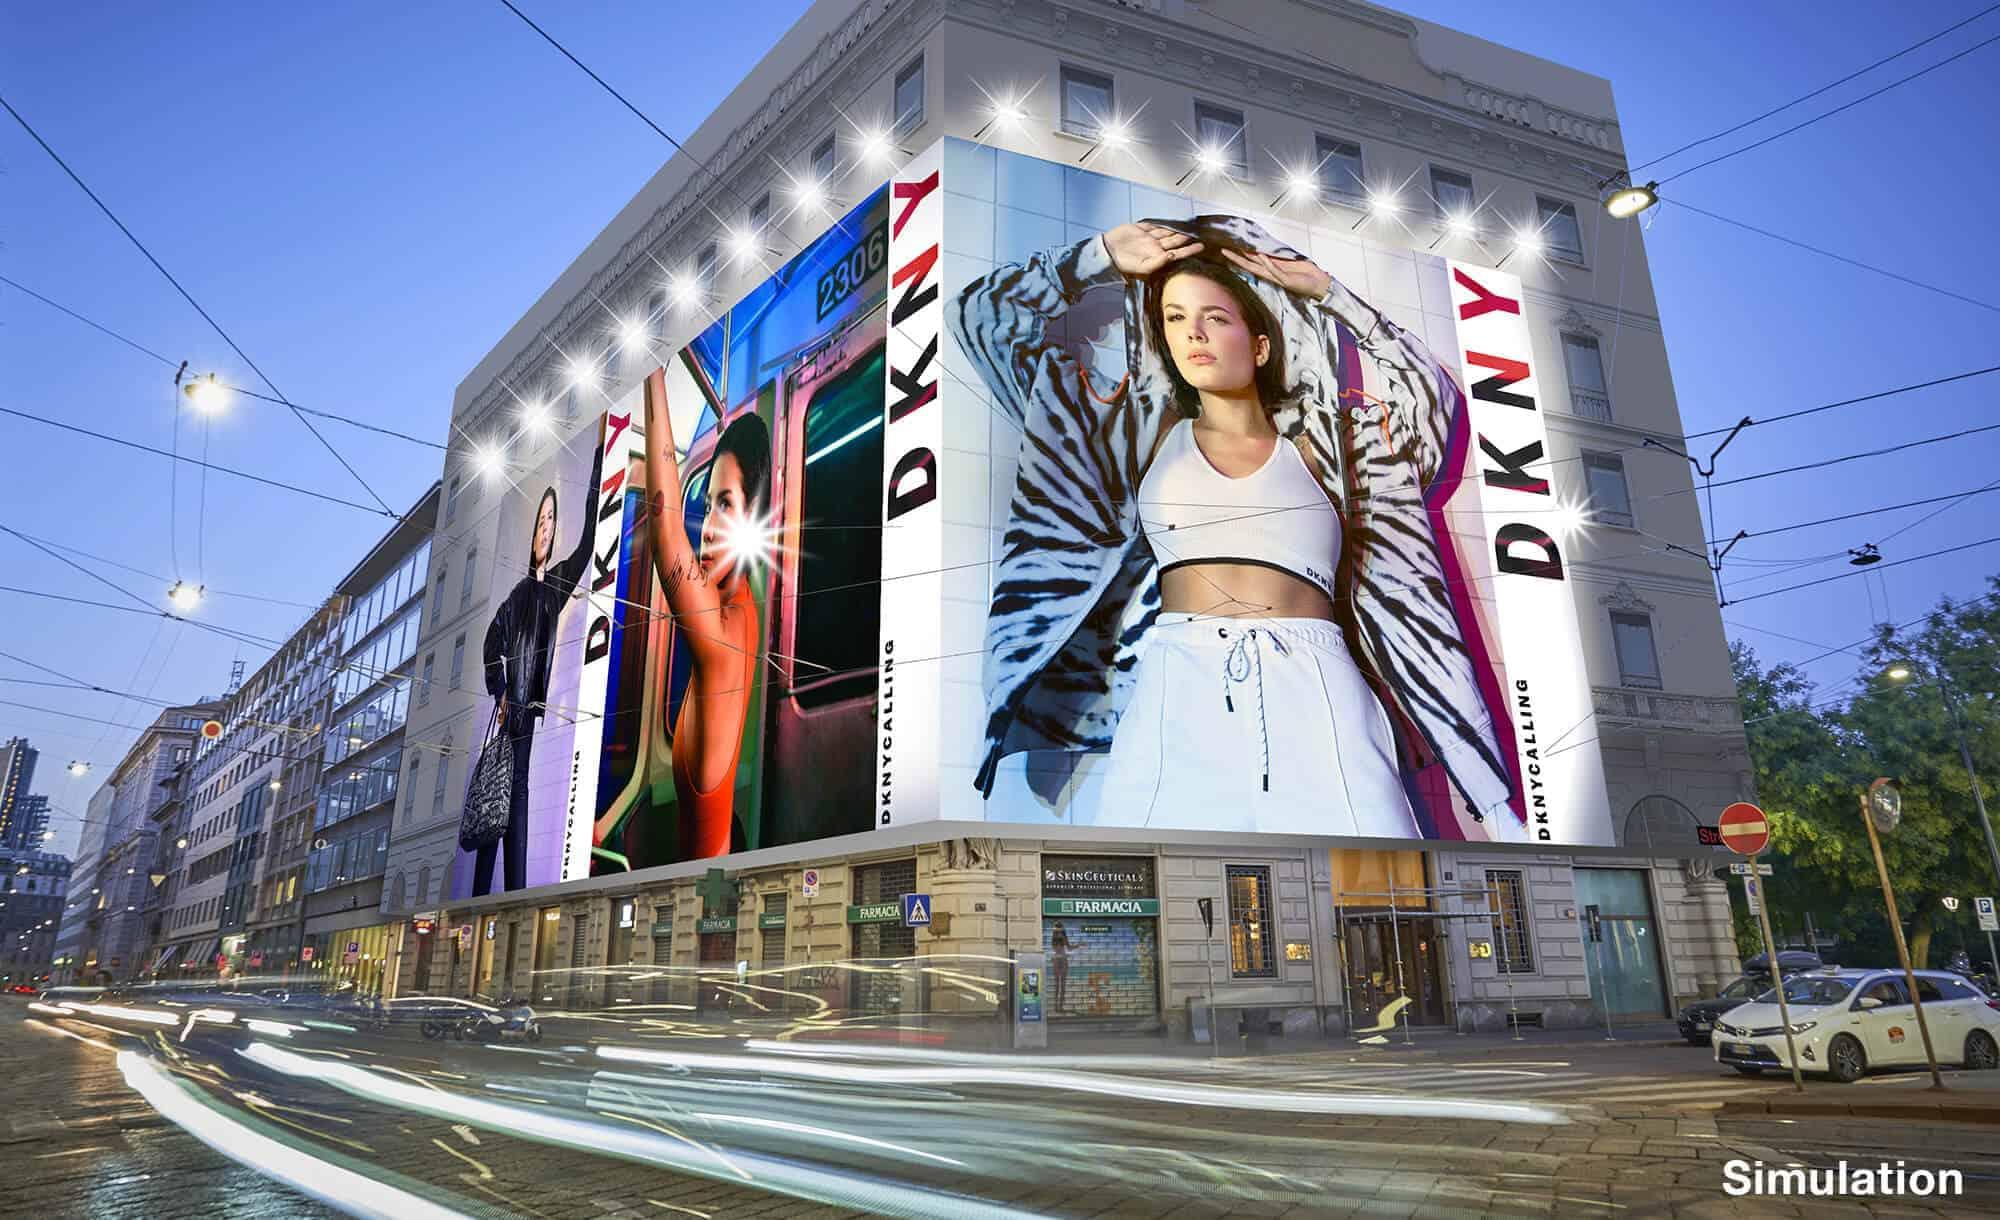 Maxi Affisione a Milano in Piazza Cavour 5 con DKNY (Fashion)